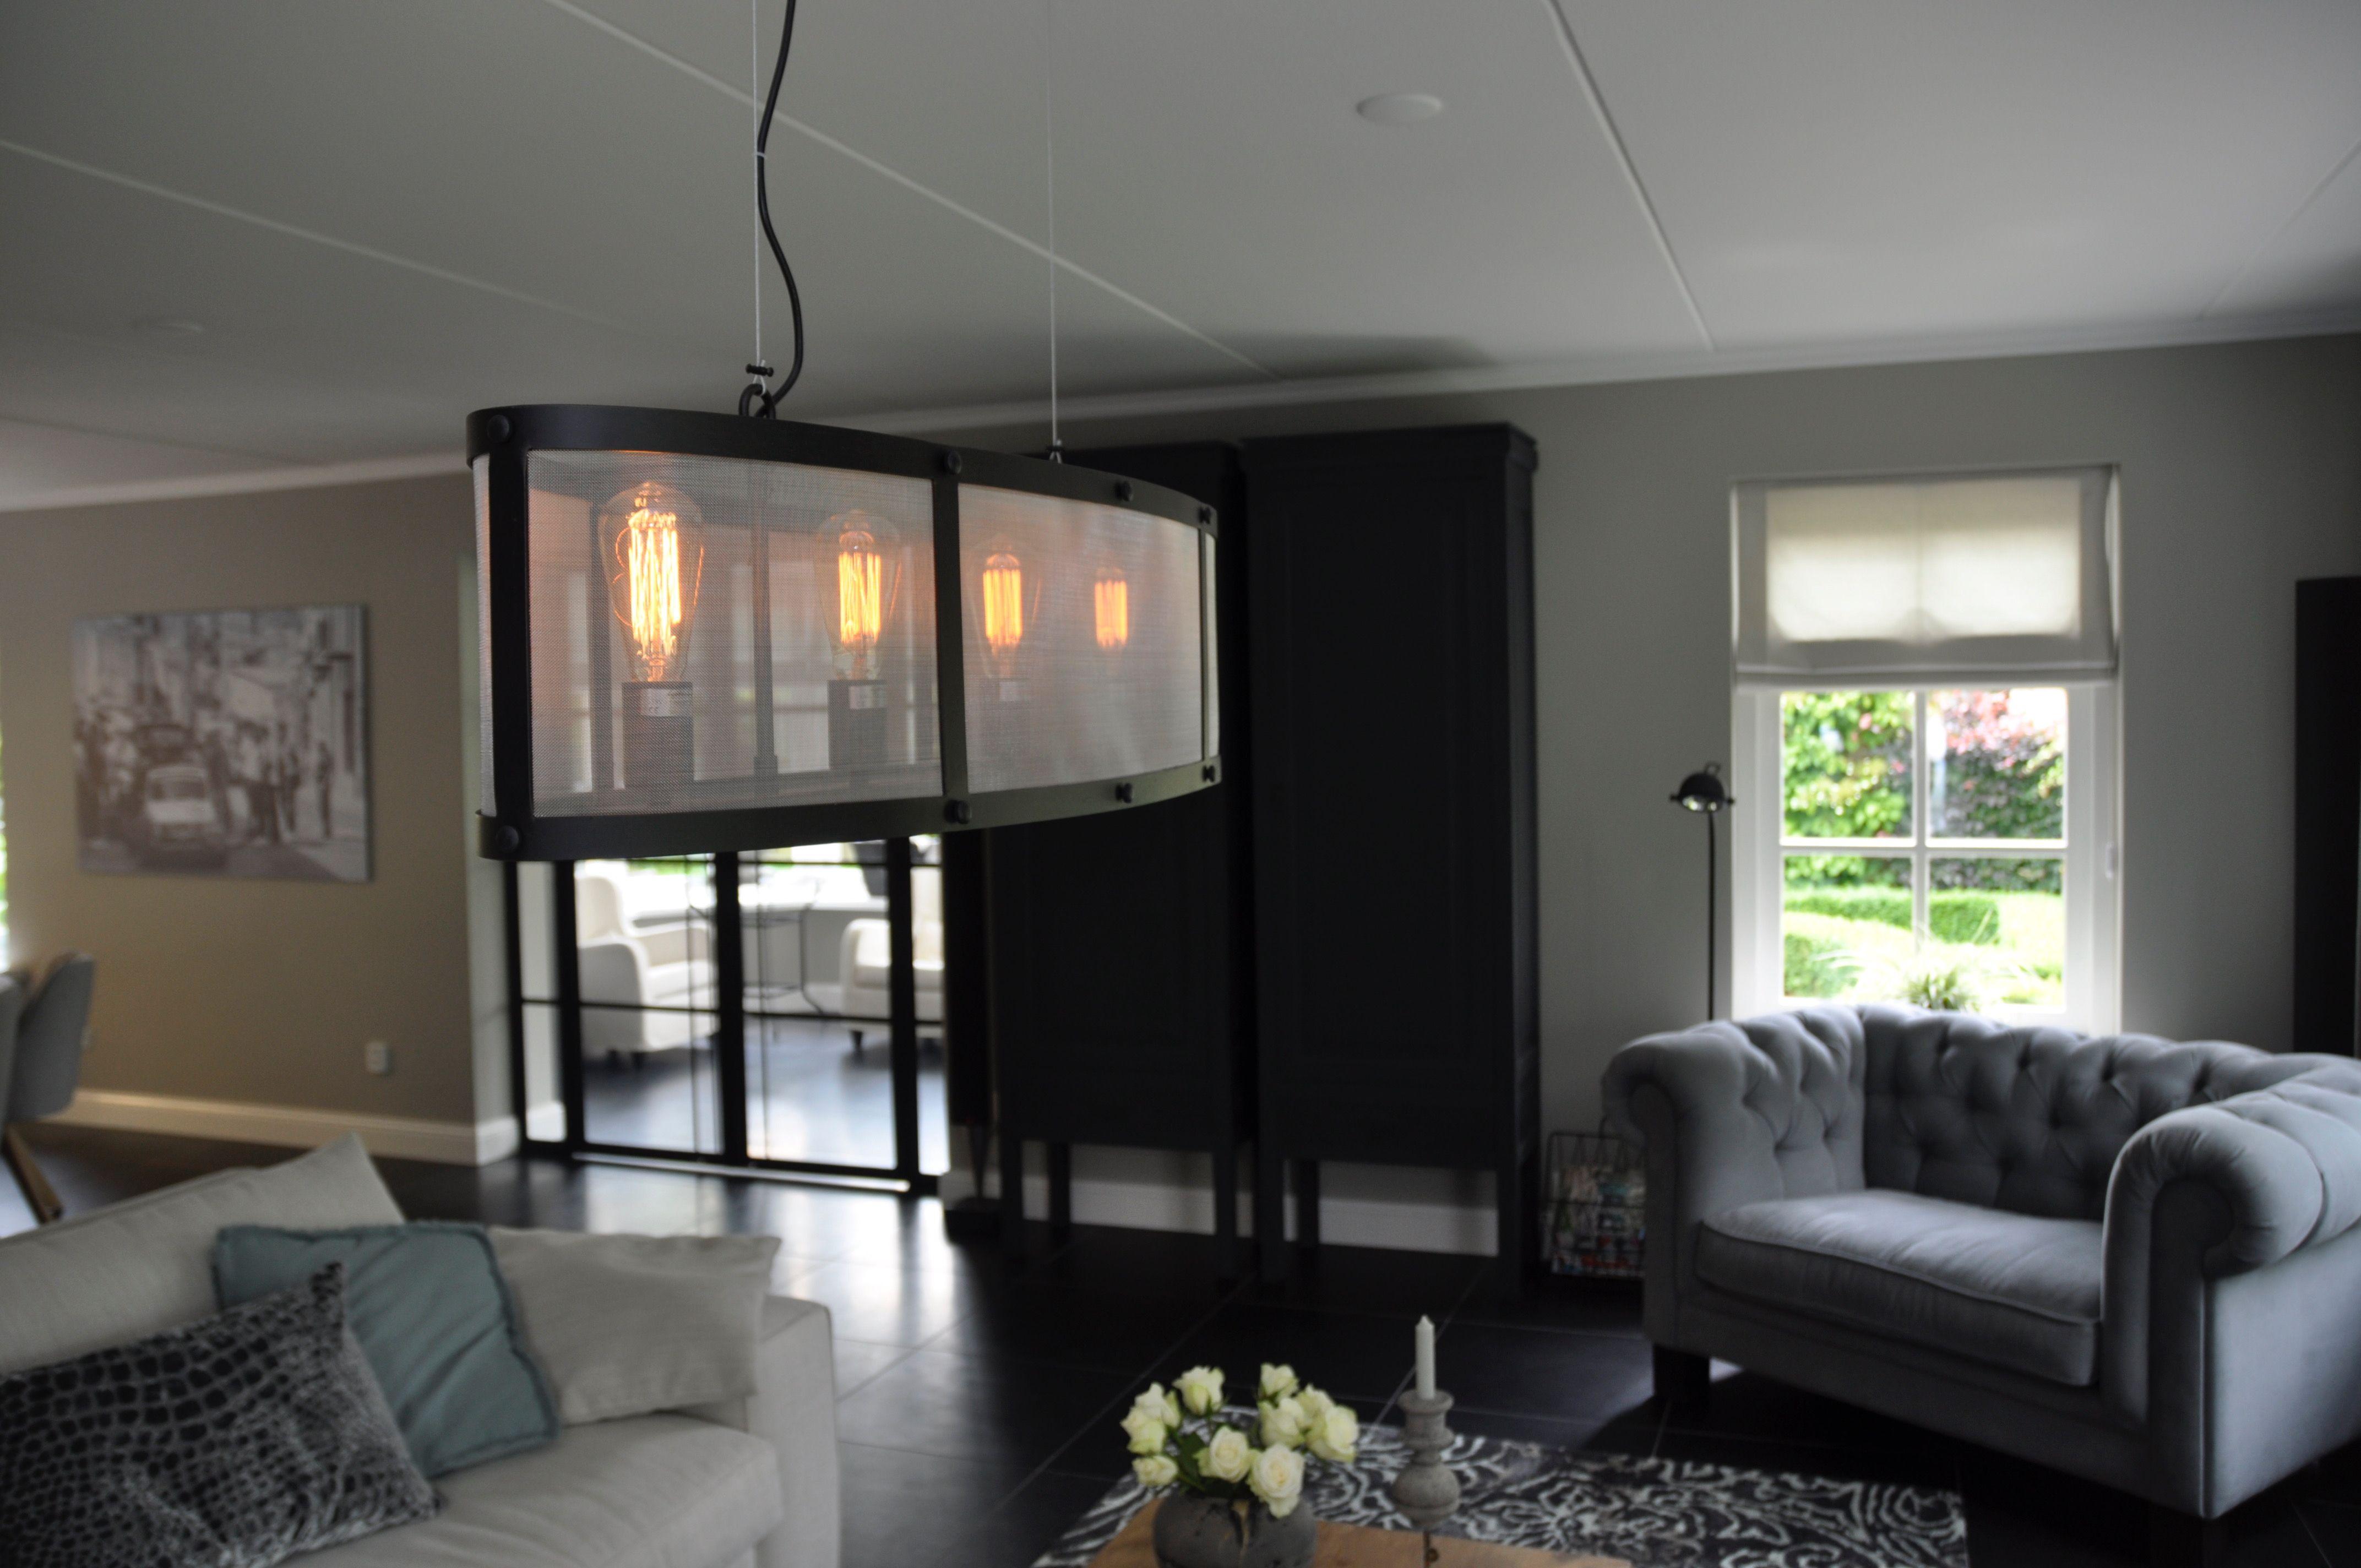 Interieur idee woonkamer | Novitaz | Pinterest